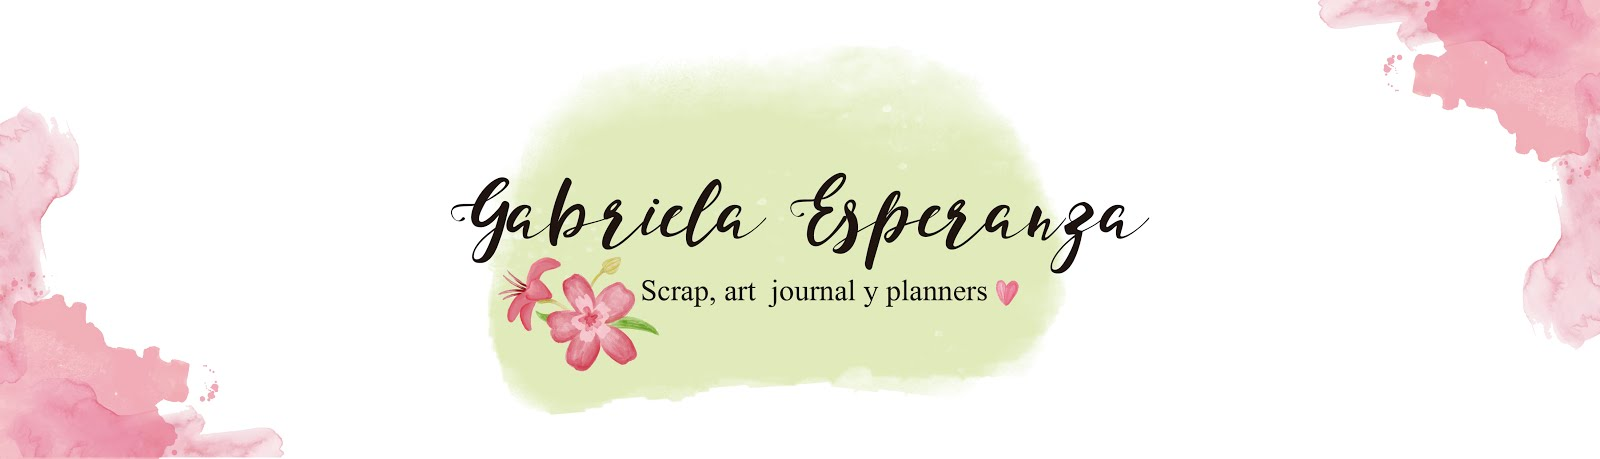 Gabriela Esperanza Scrapbooking.